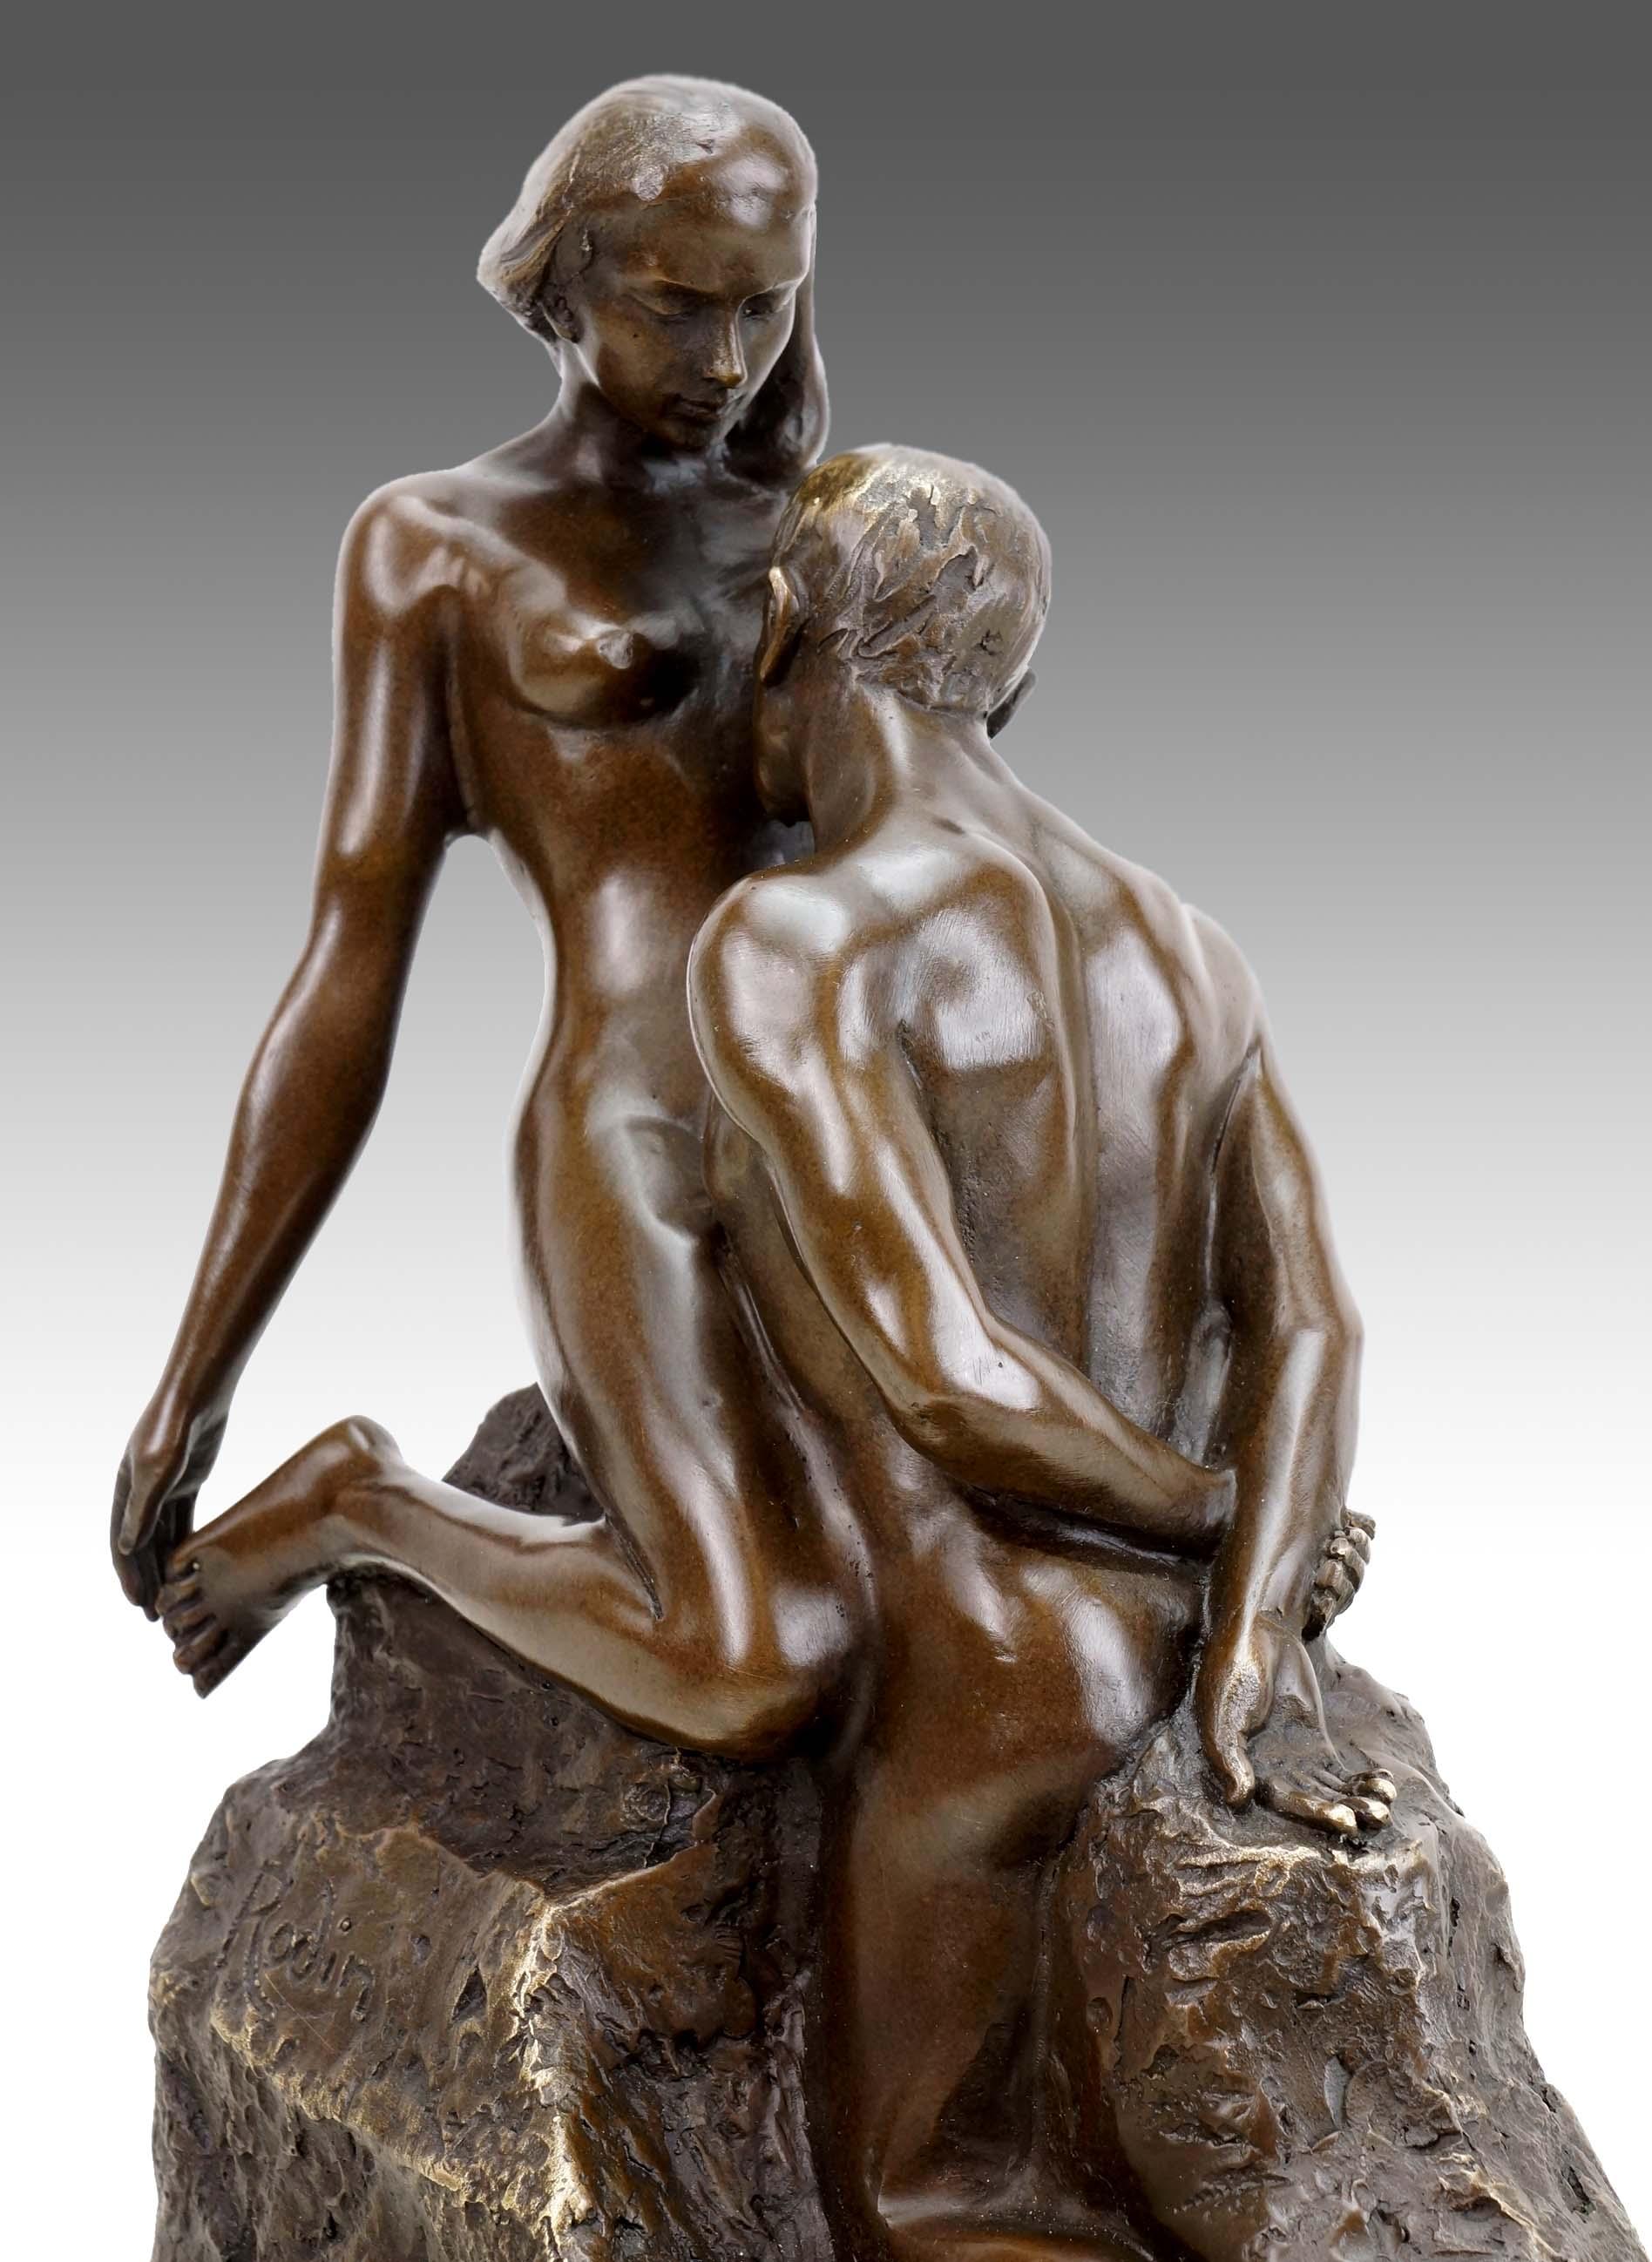 A bronze sculpture of the kiss after rodin